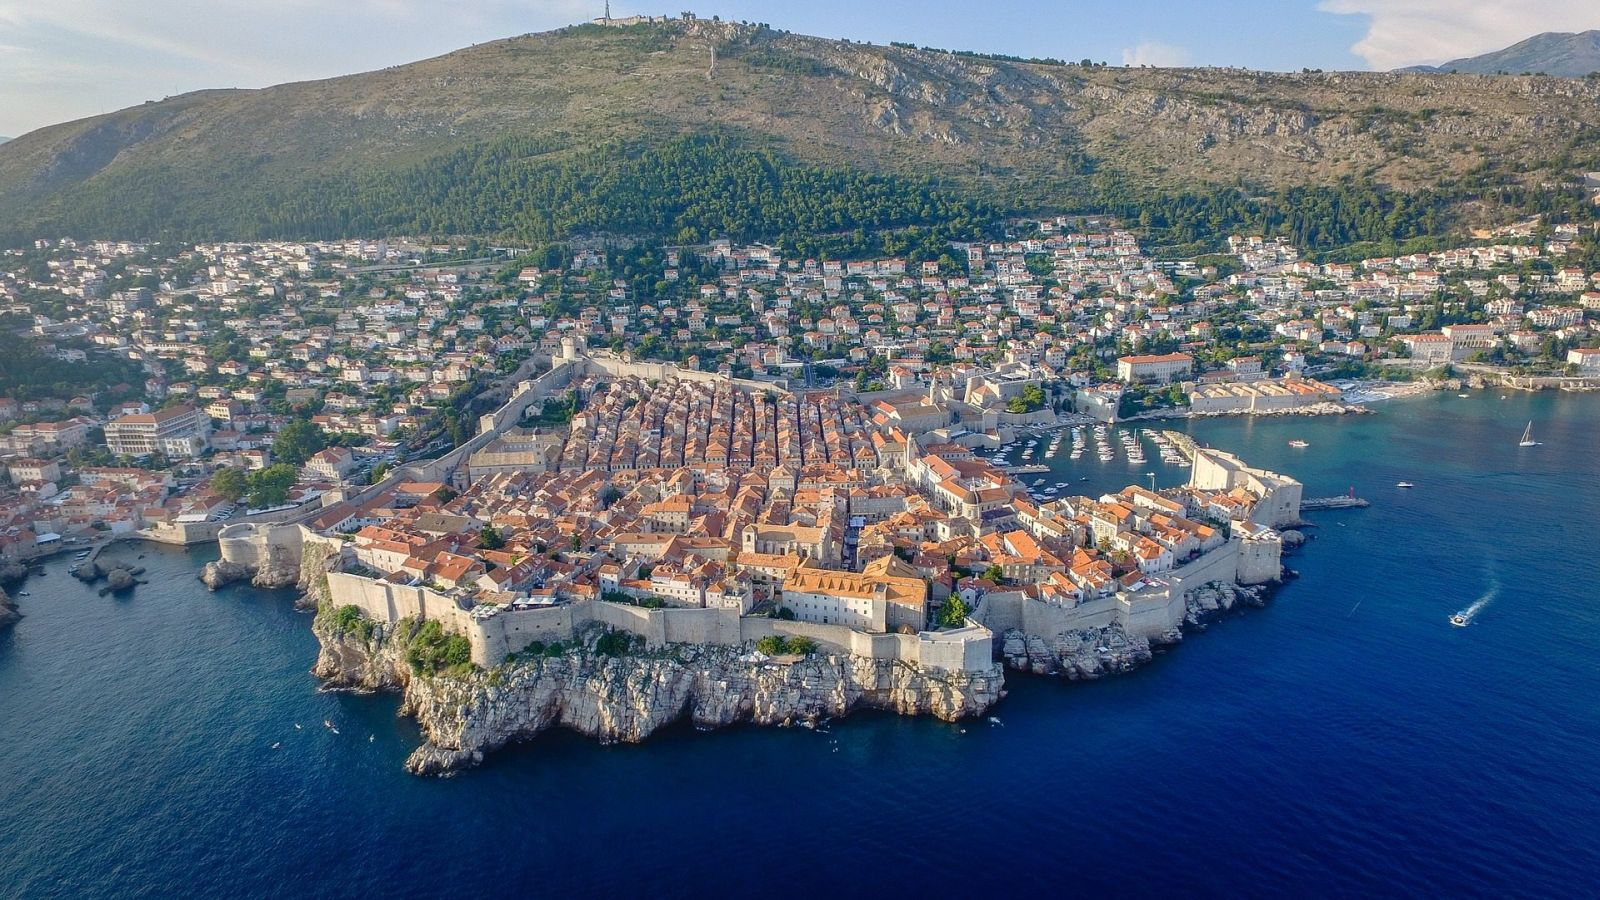 unesco world heritage sites in croatia by mouli